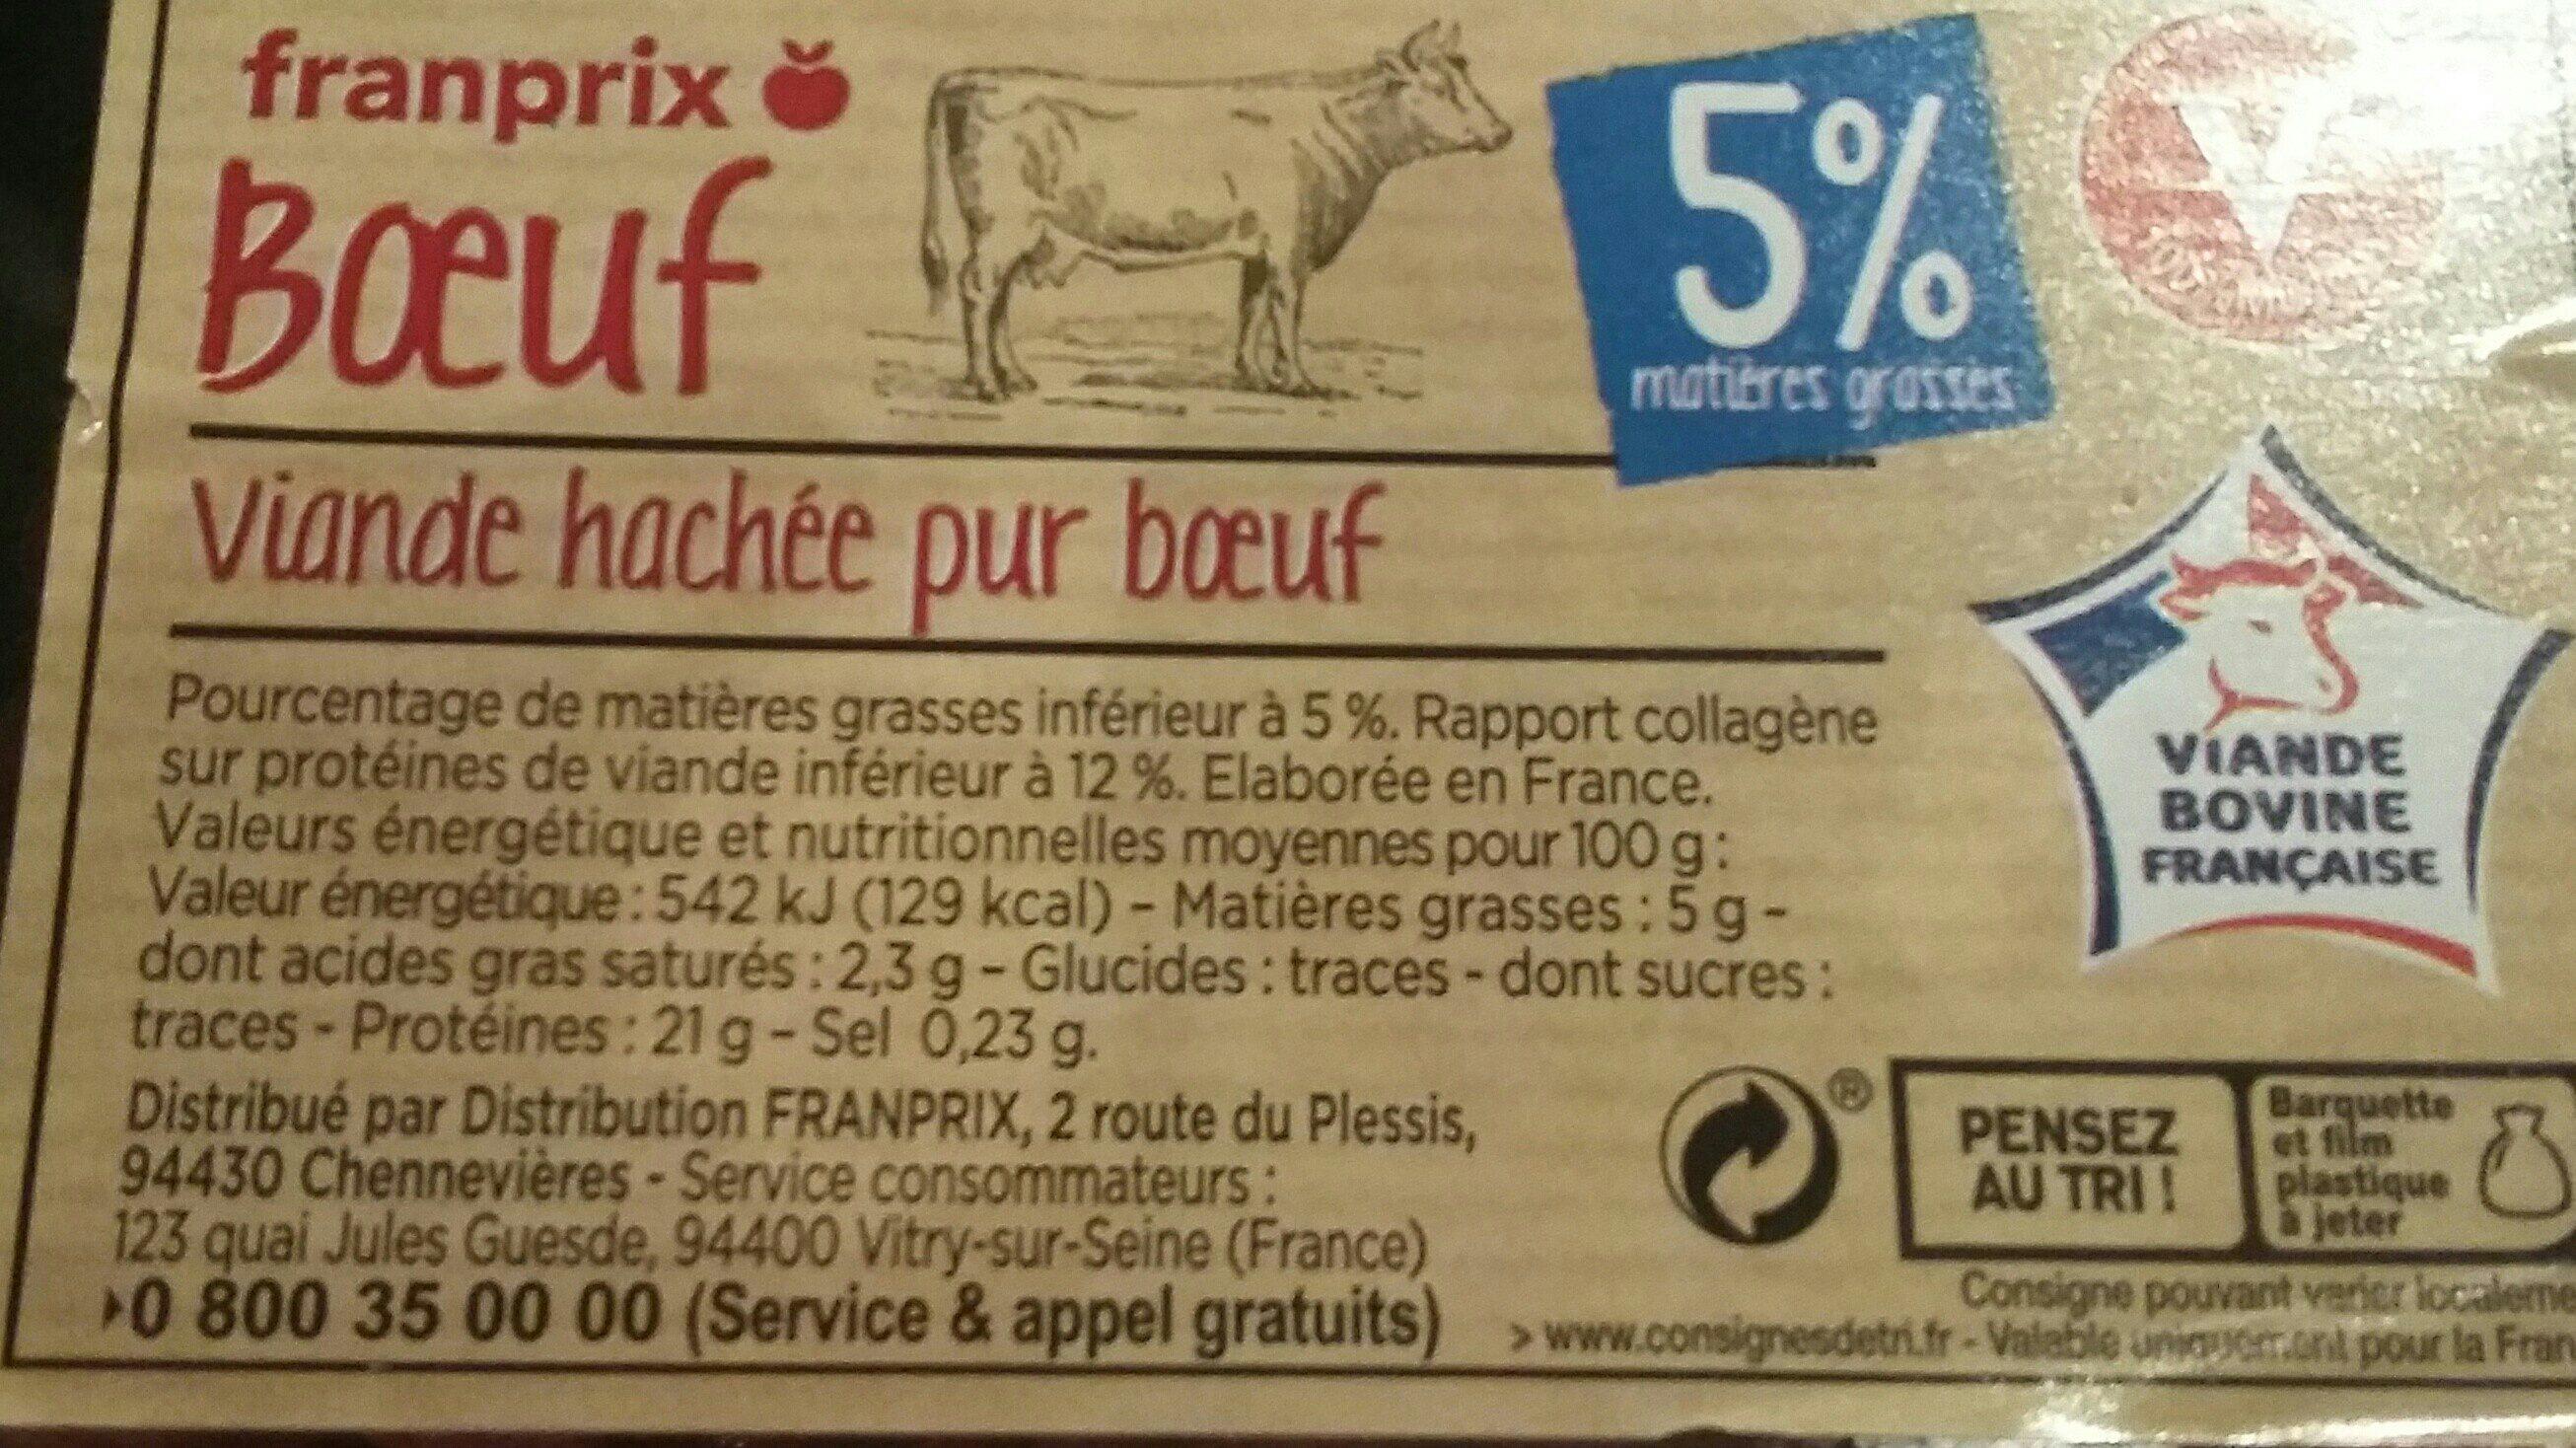 Viande hachée pur boeuf 5% - Ingrediënten - fr